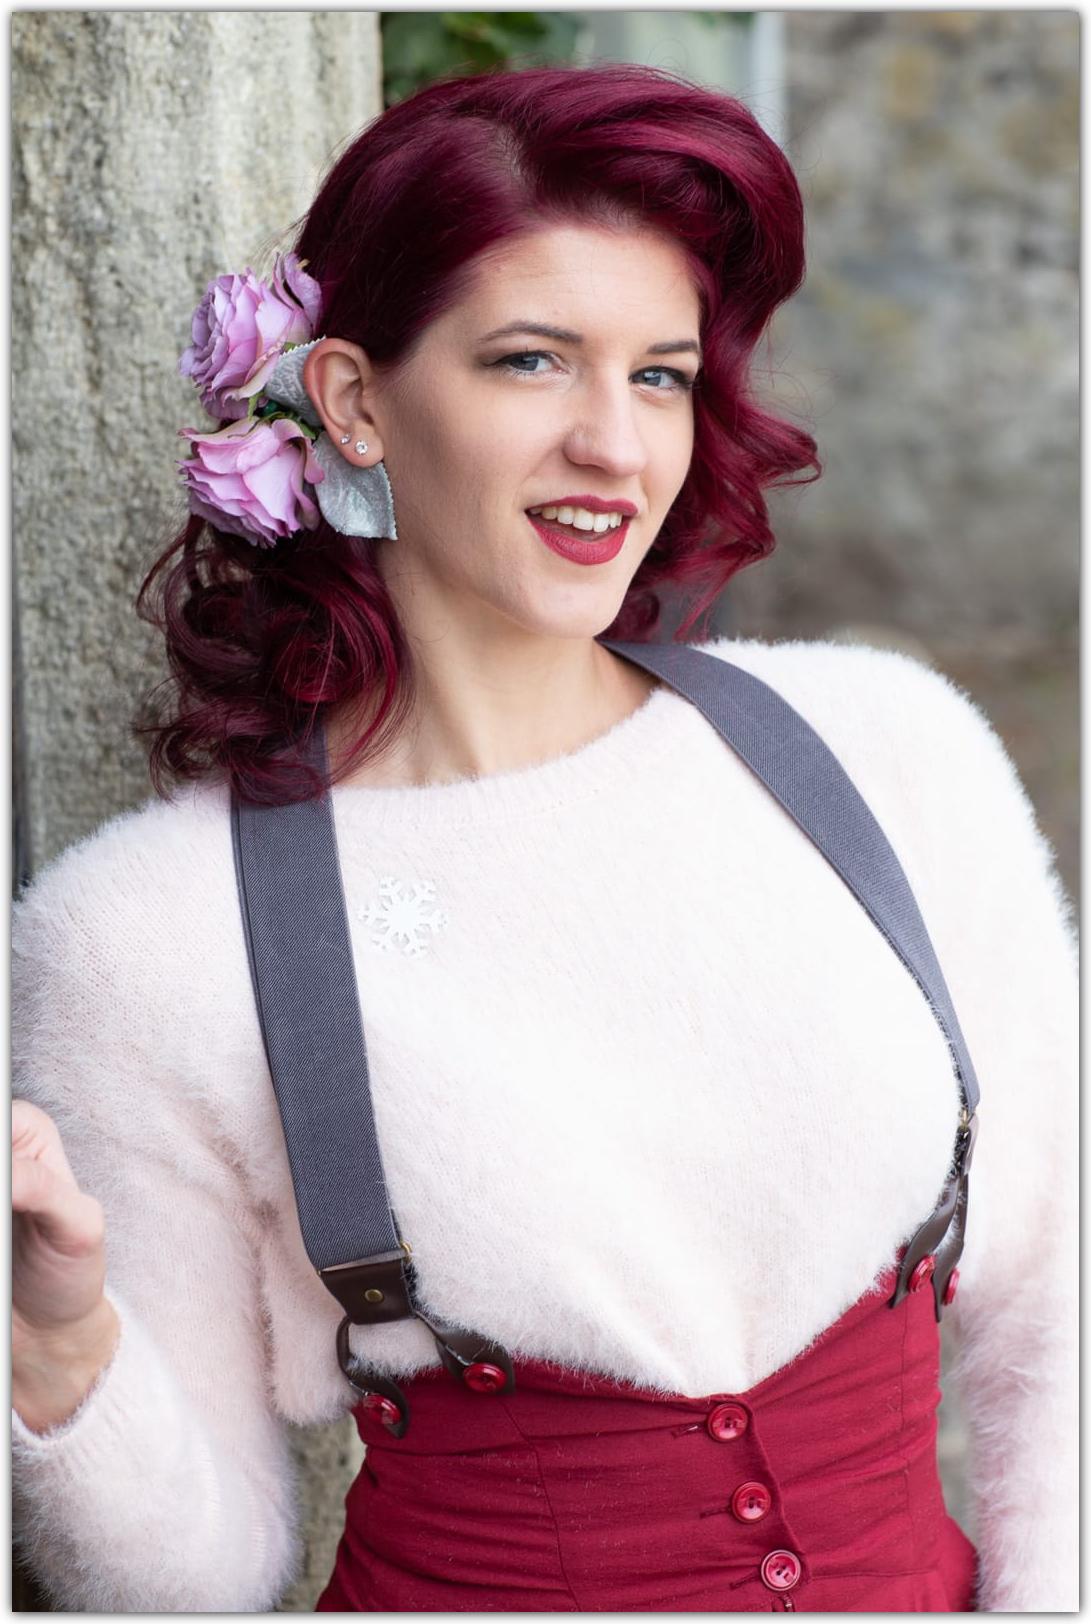 Sam aka Ruby Diamond. Picture from www.beautifulpics.ch